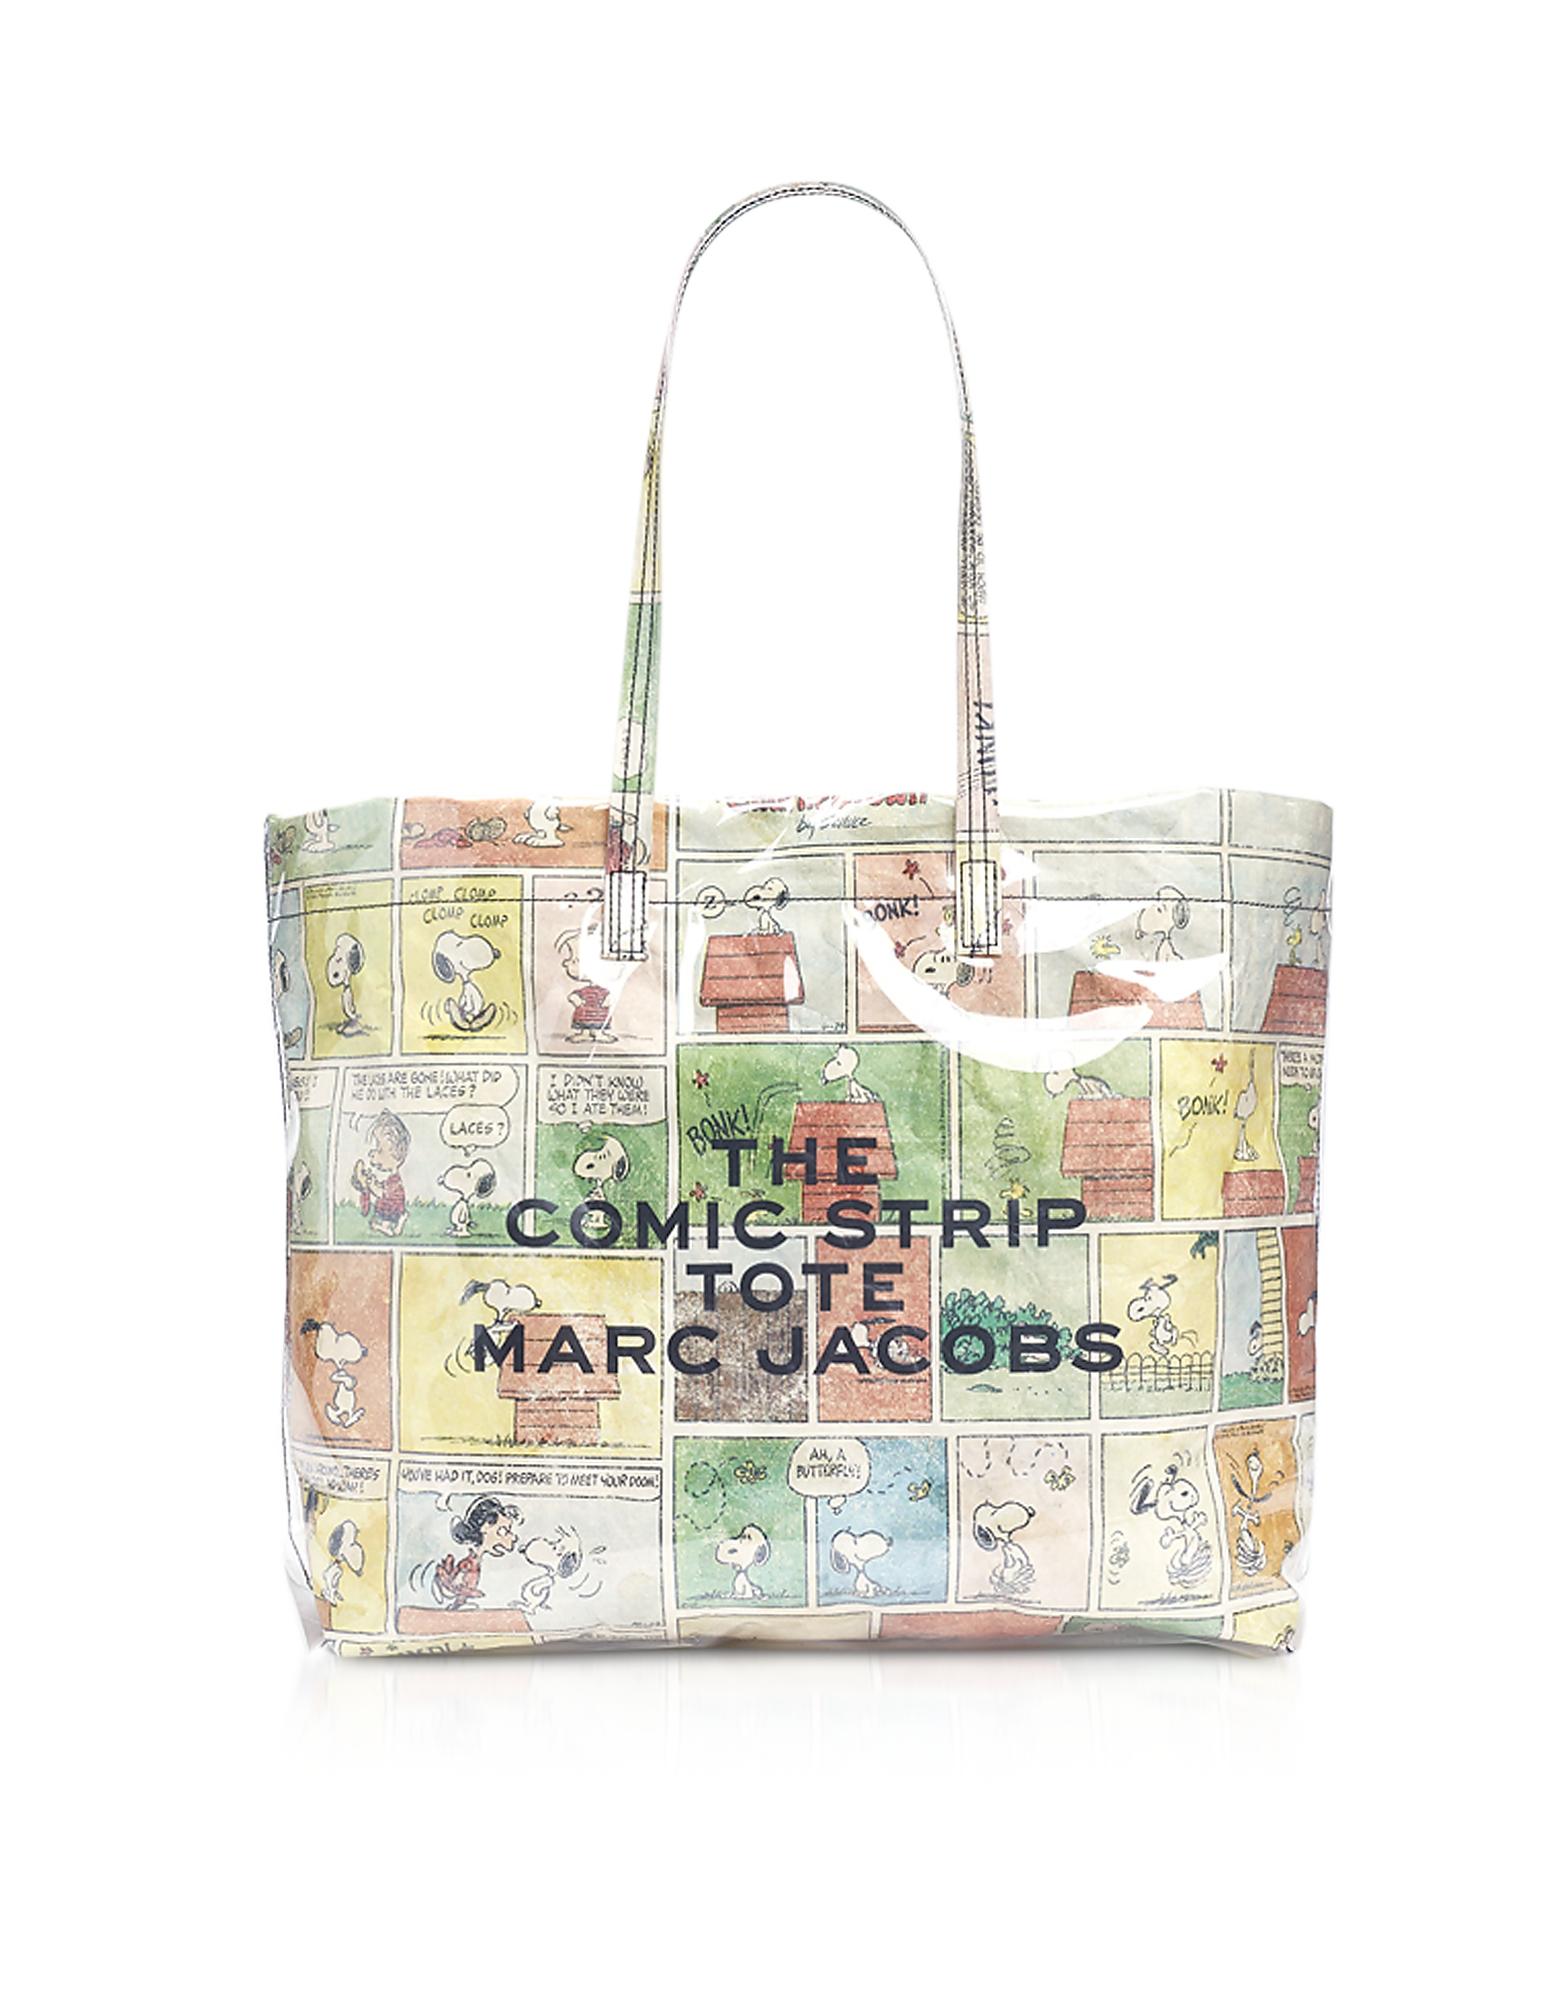 The Comic Strip Tote Bag